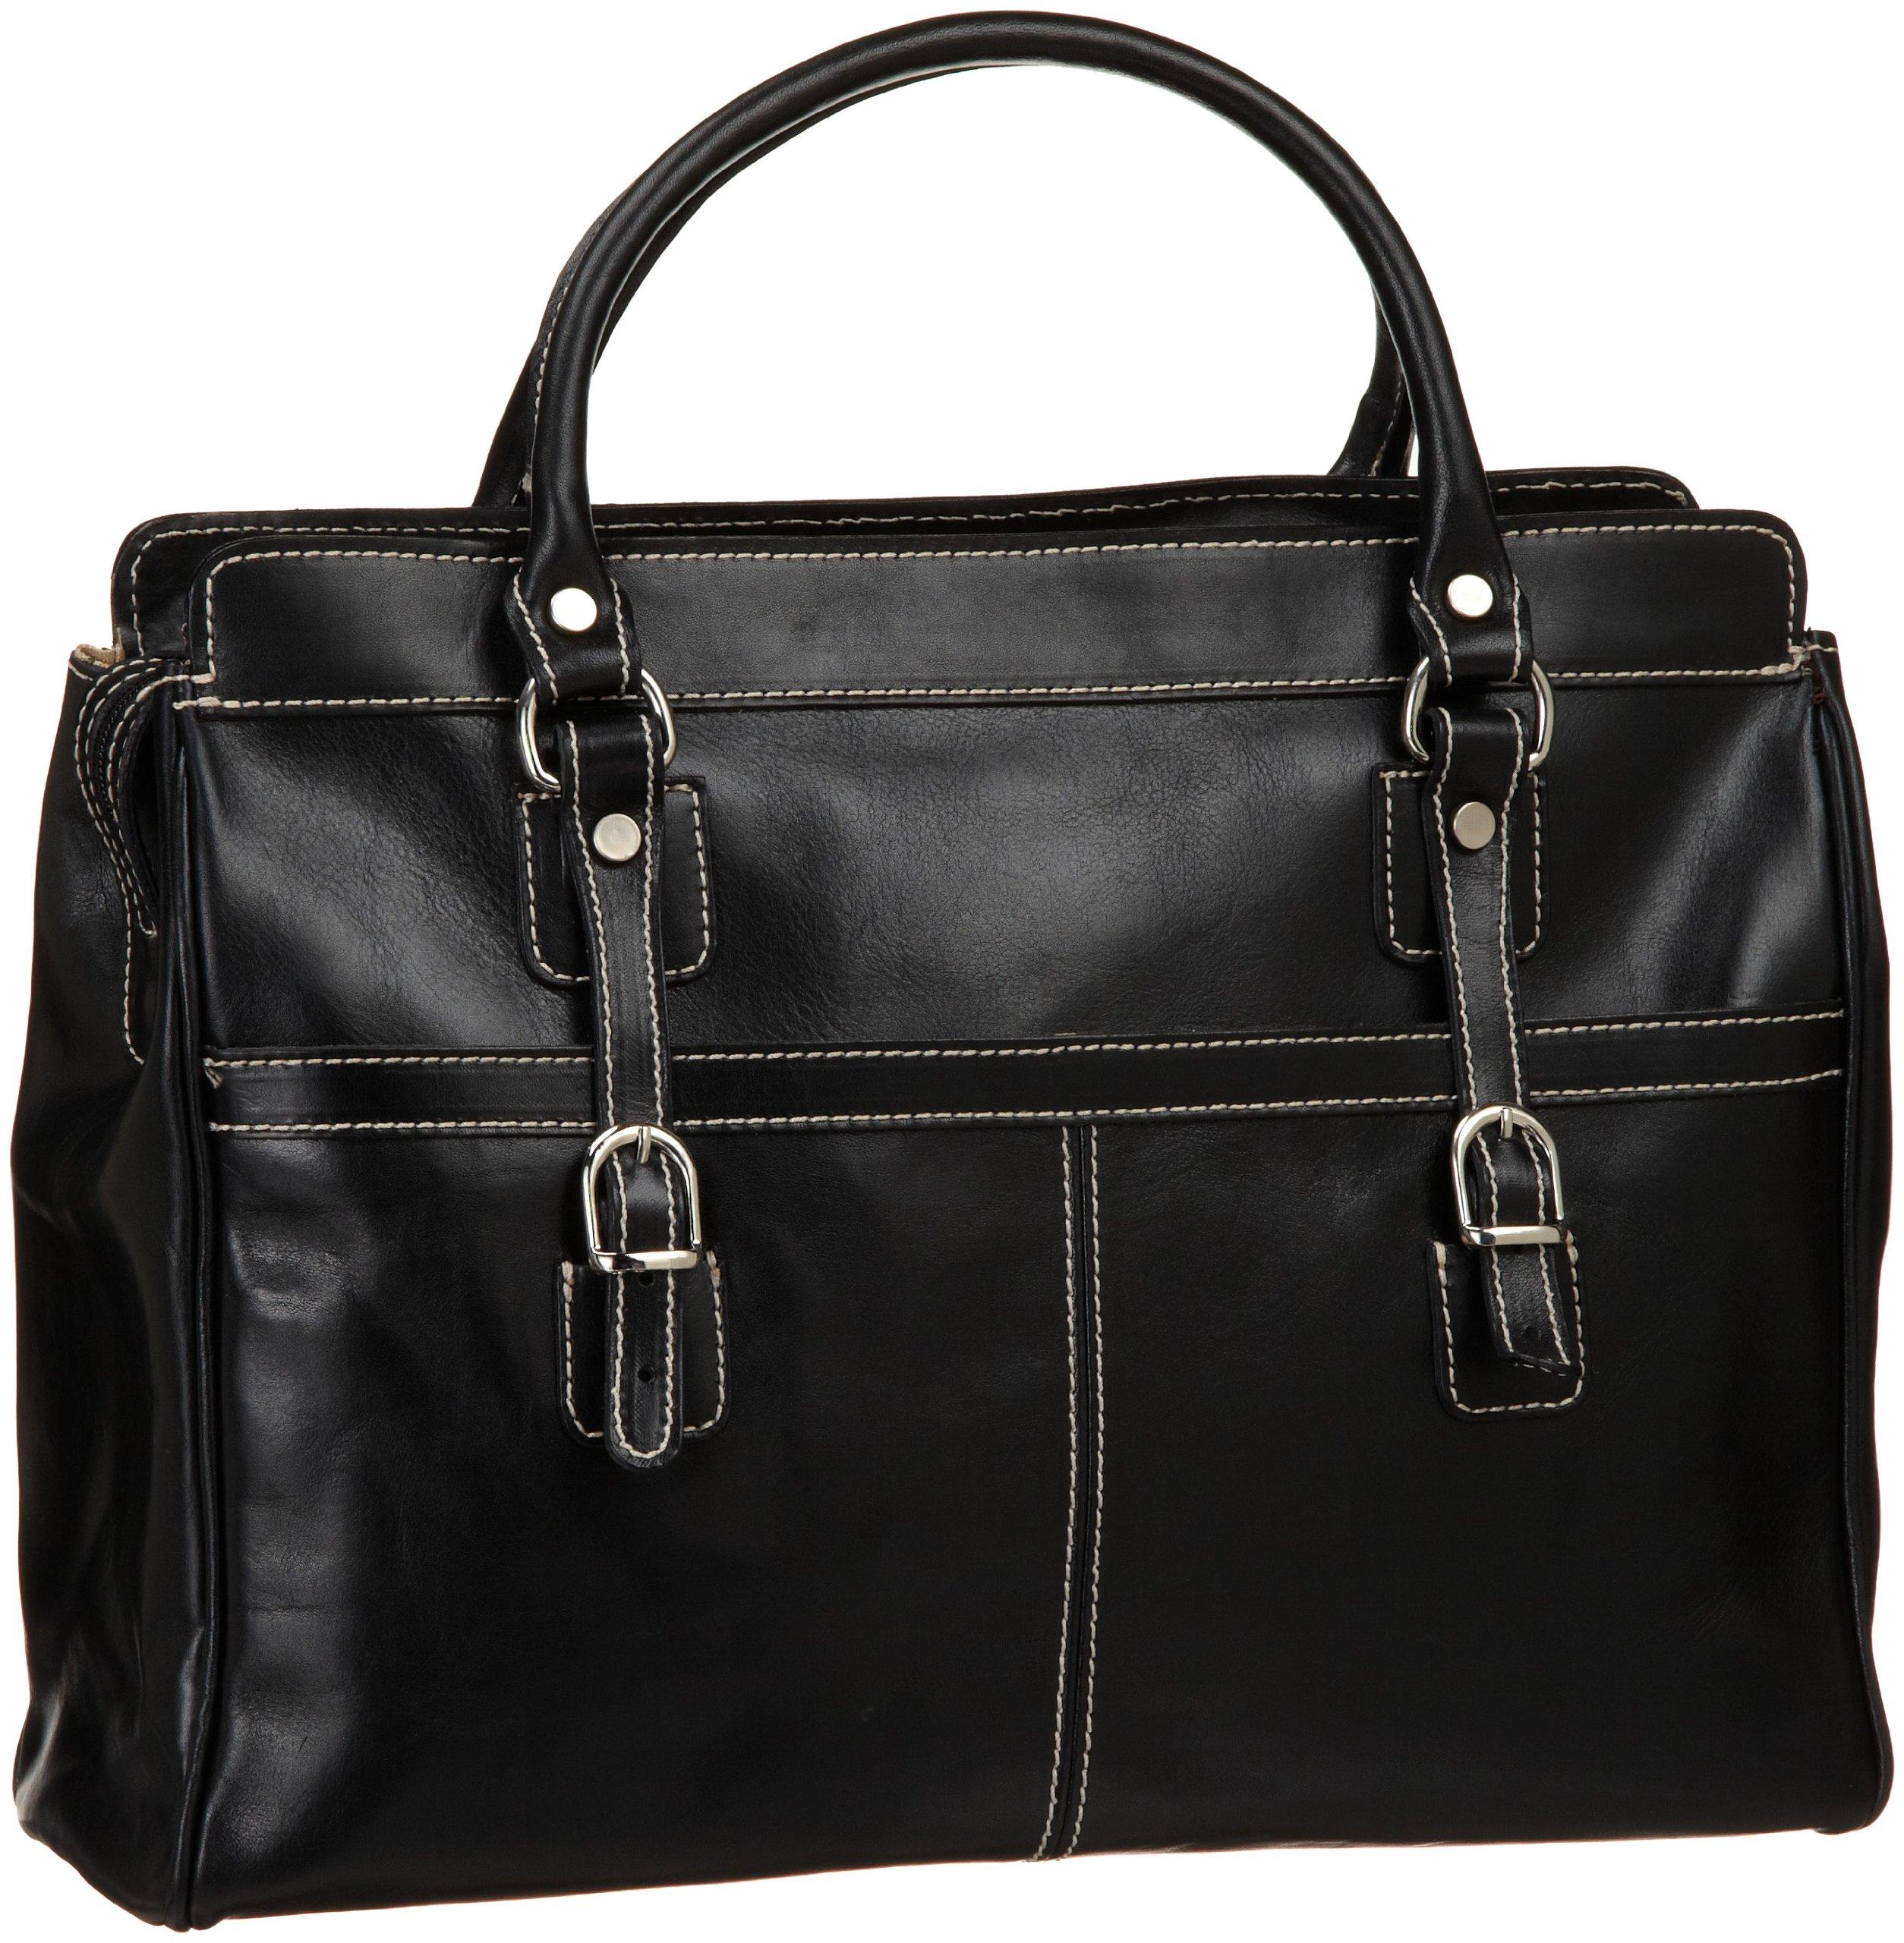 Floto Casiana Mini Handbag, Black, One Size